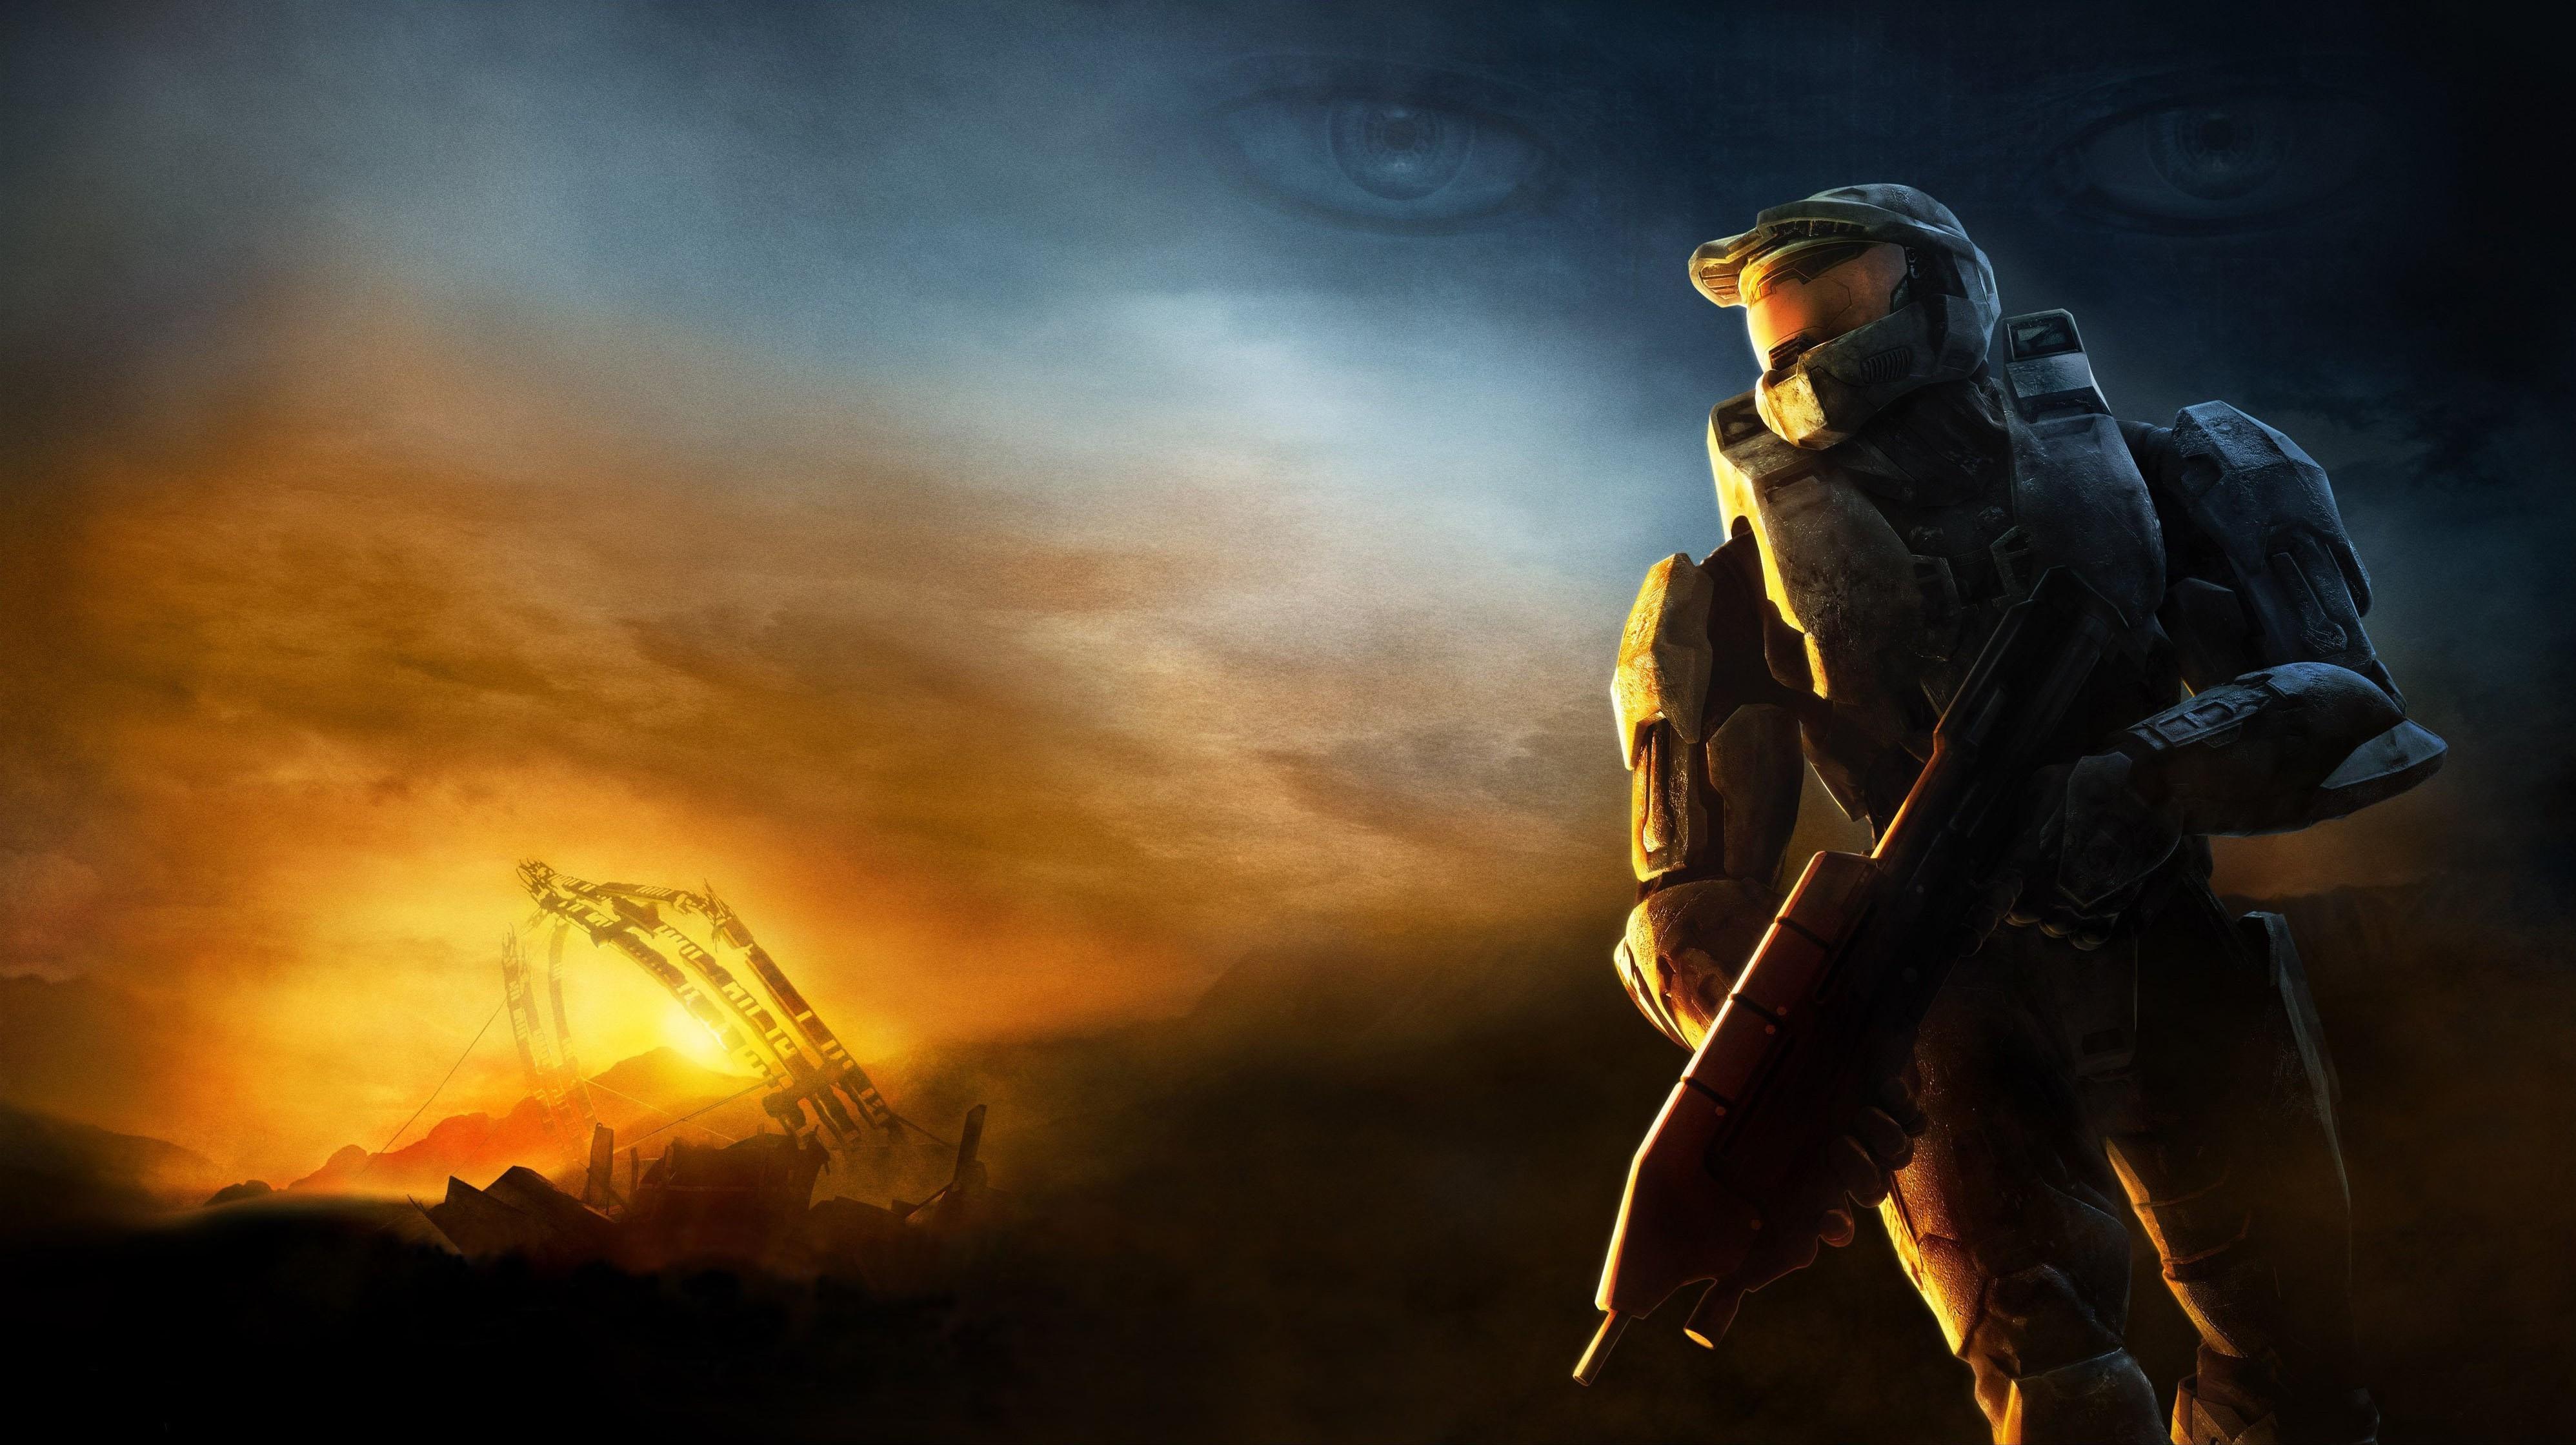 Master Chief Halo 3 Video Games Cortana Wallpapers HD Desktop 3992x2240